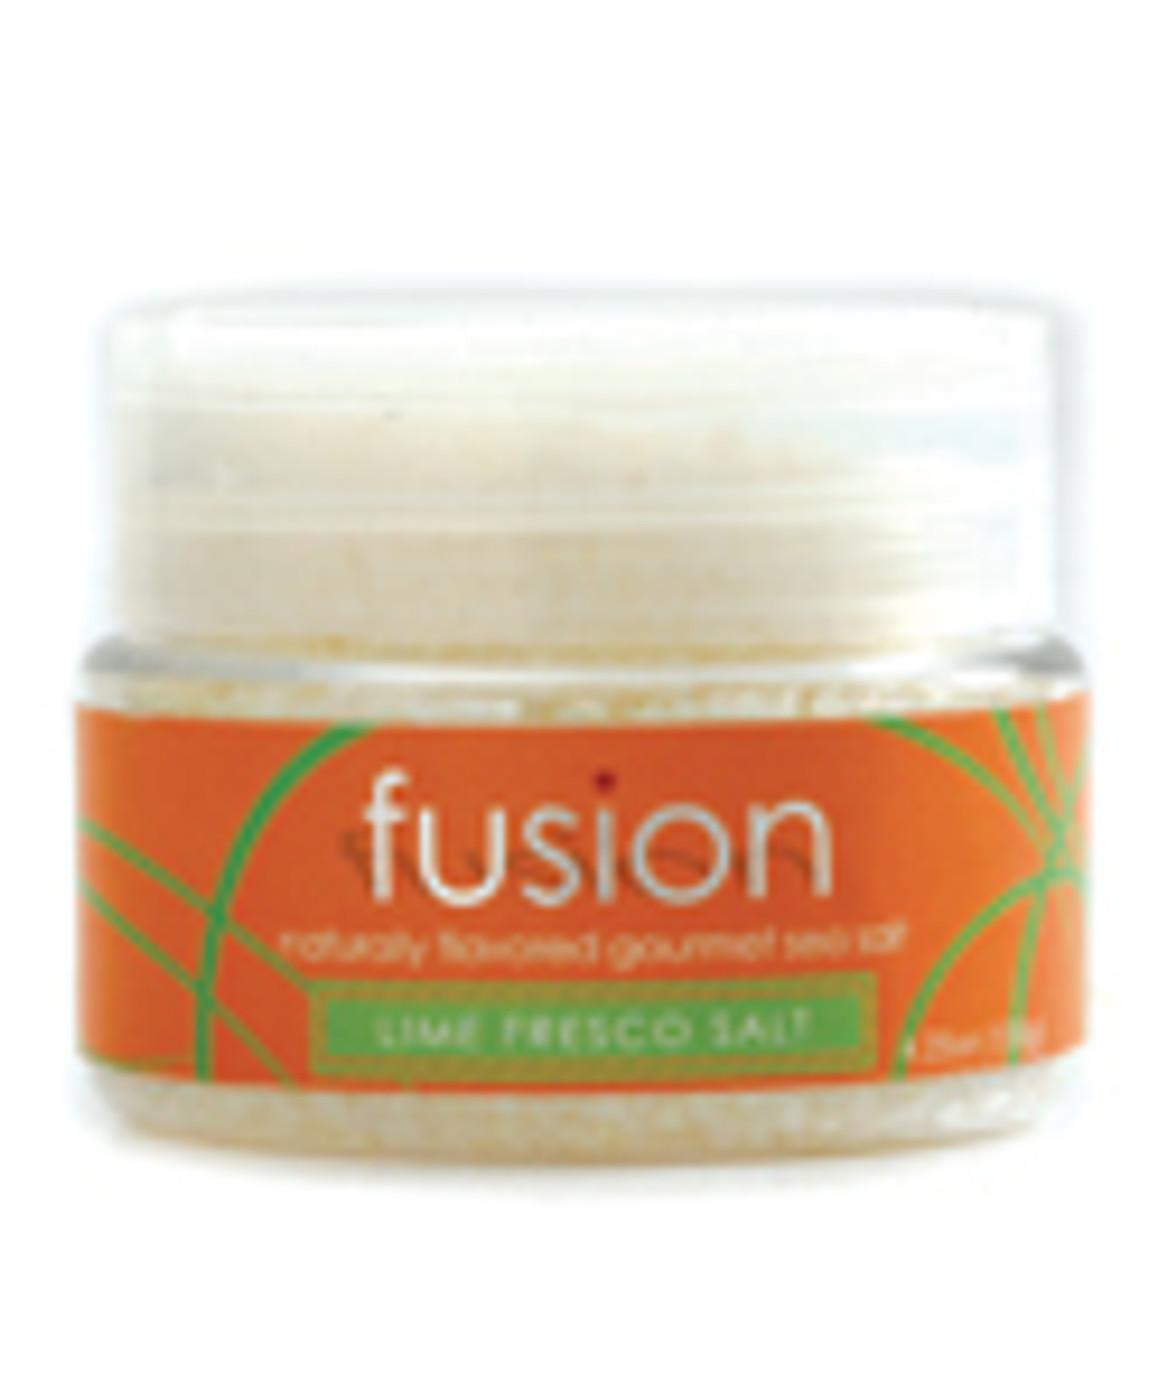 Lime Fresco Sea Salt - Fusion® - 3oz Jar